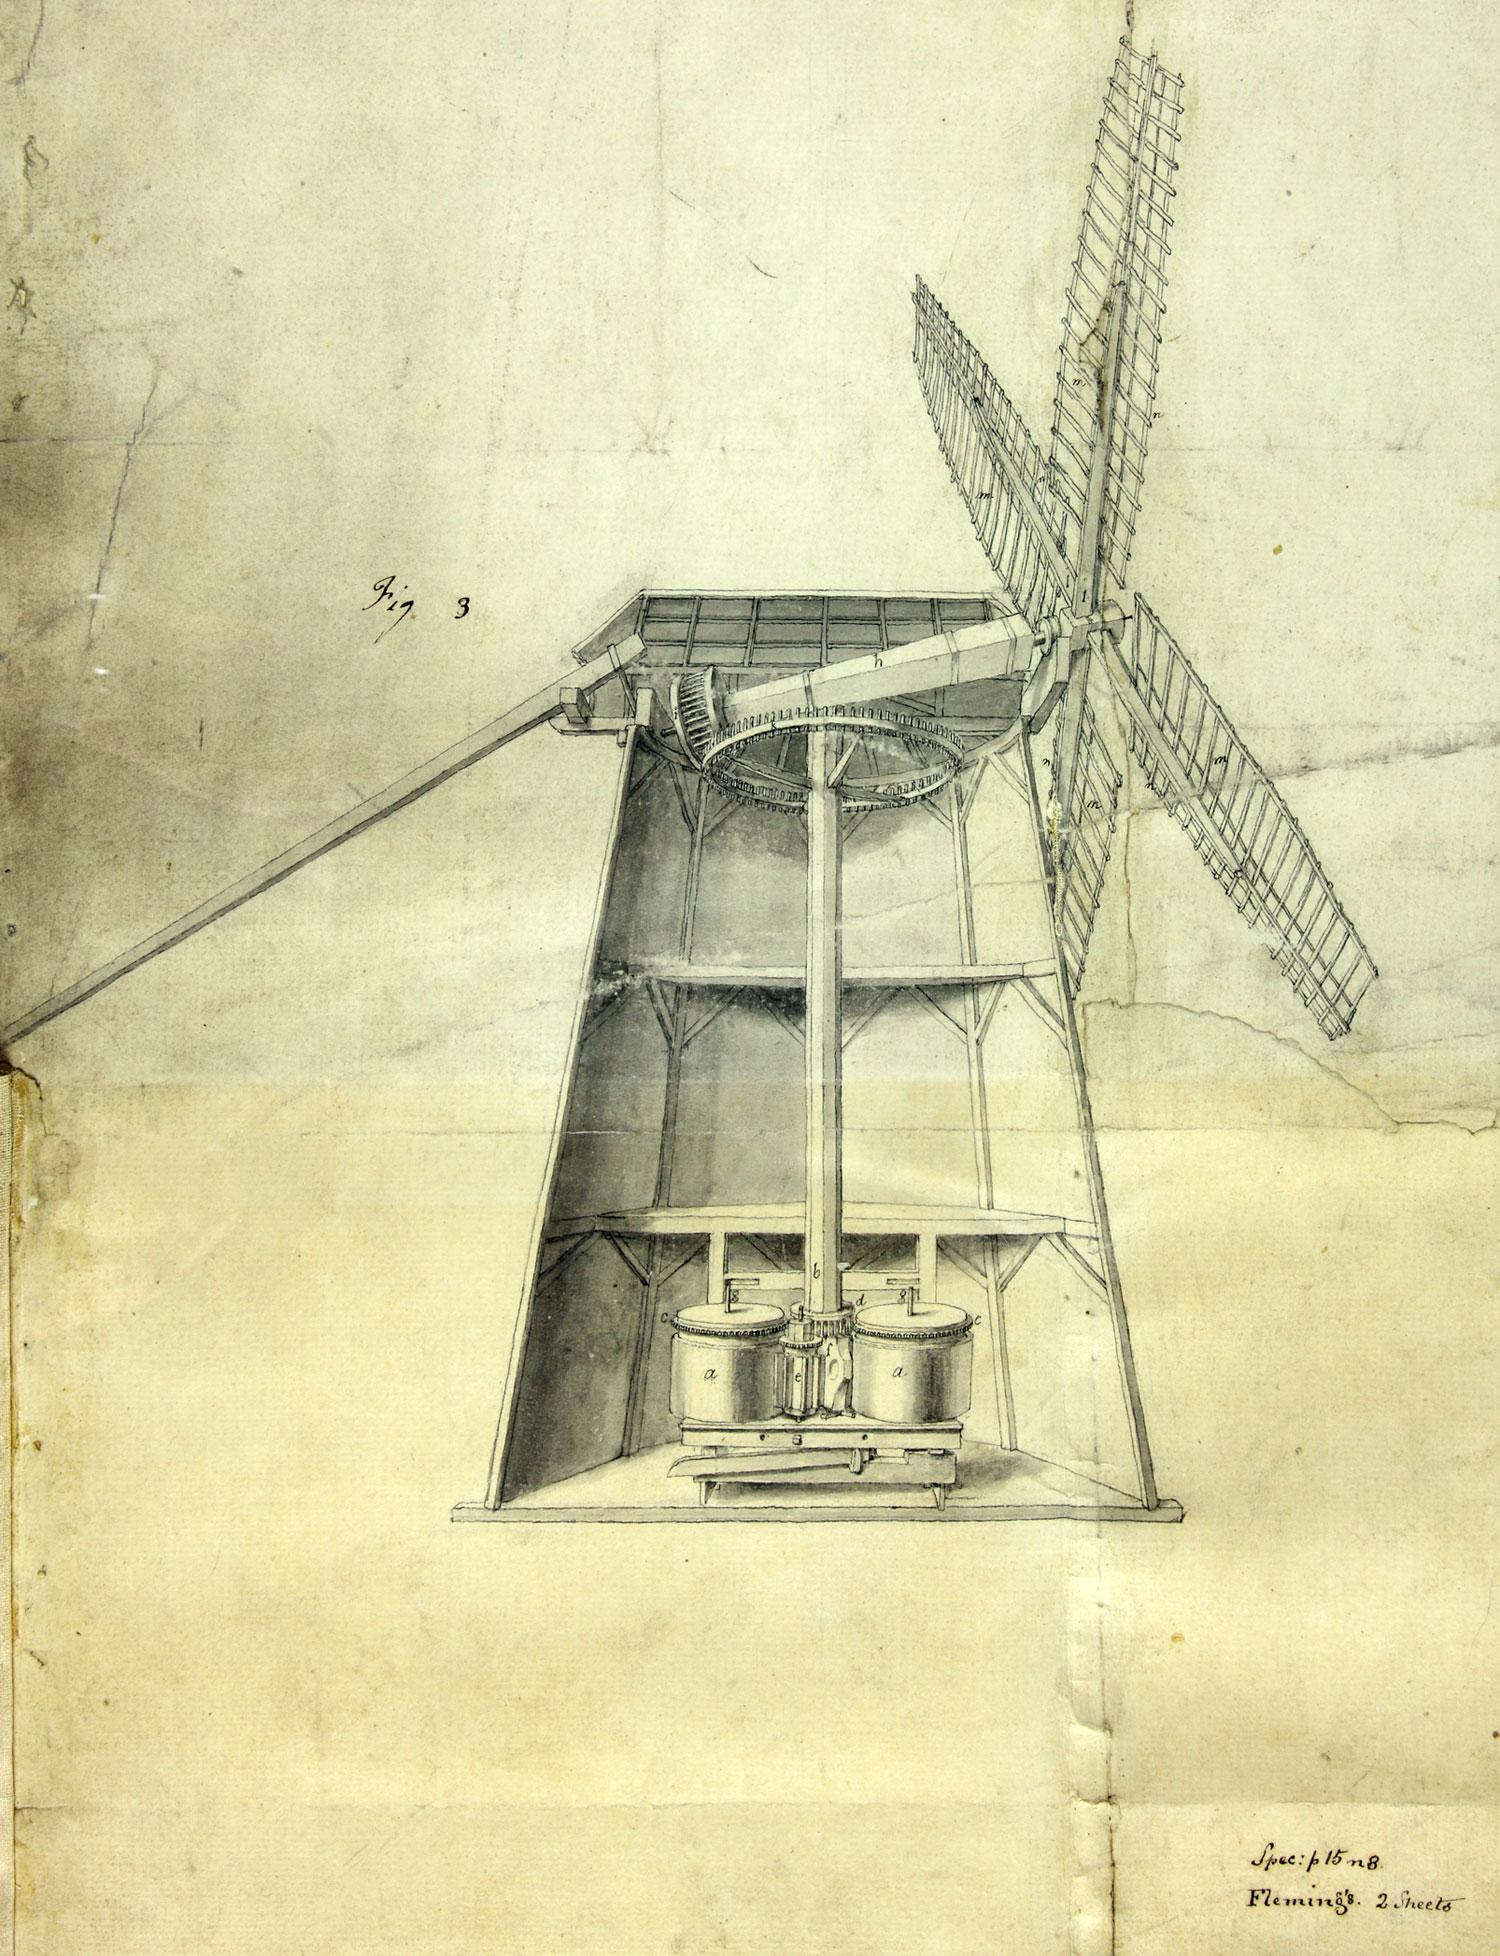 Sugar cane mill, John Fleming, 1773-1776 (C 73/15 m.21 (2))